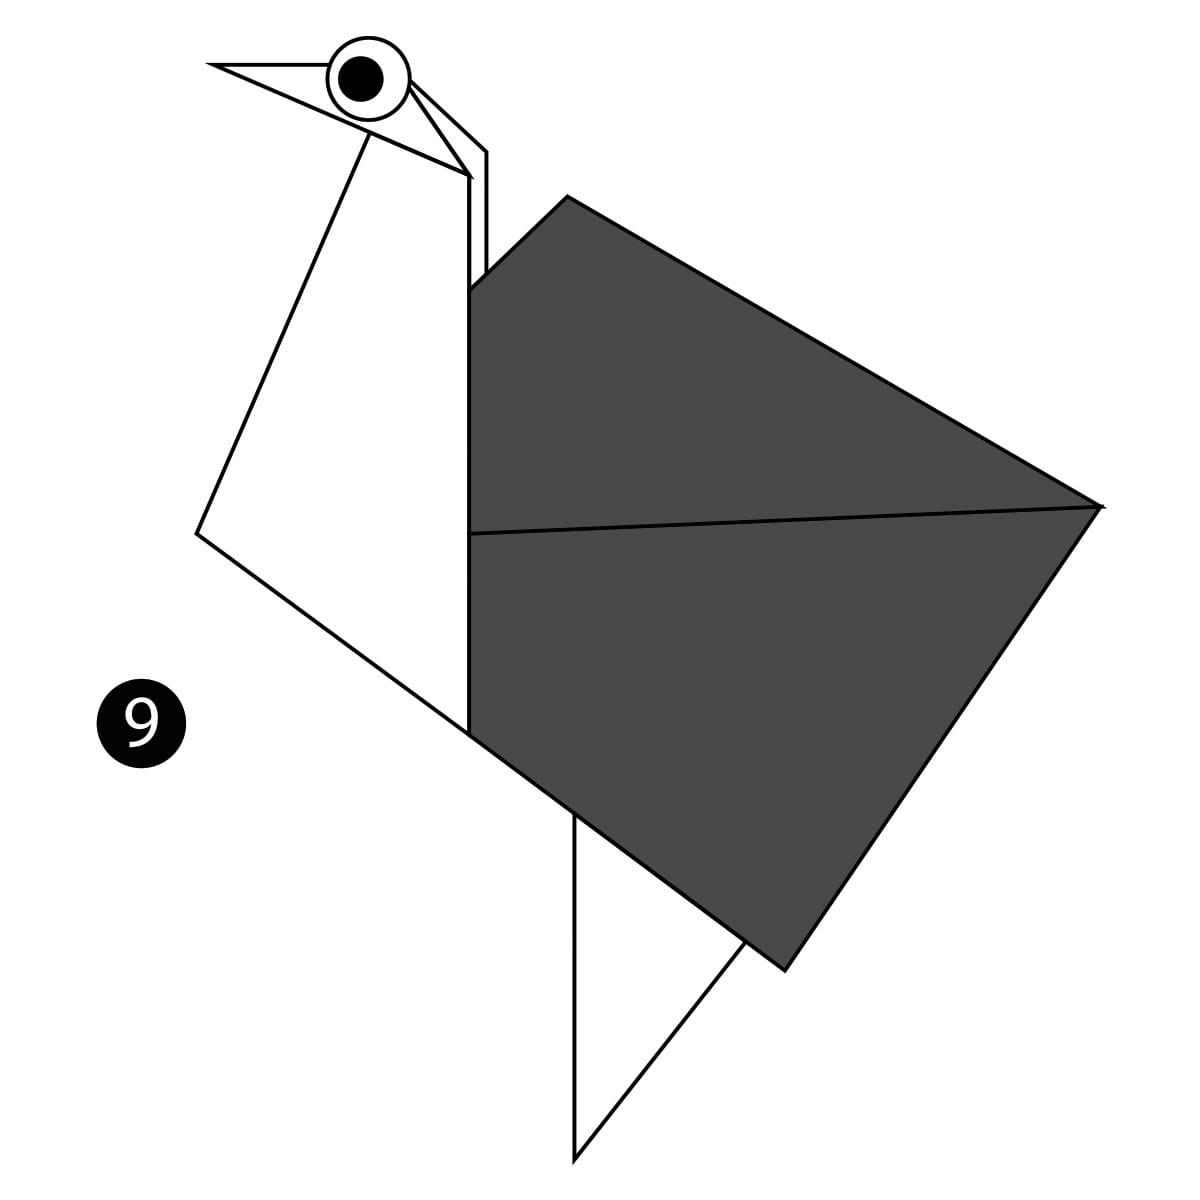 Ostrich Step 9